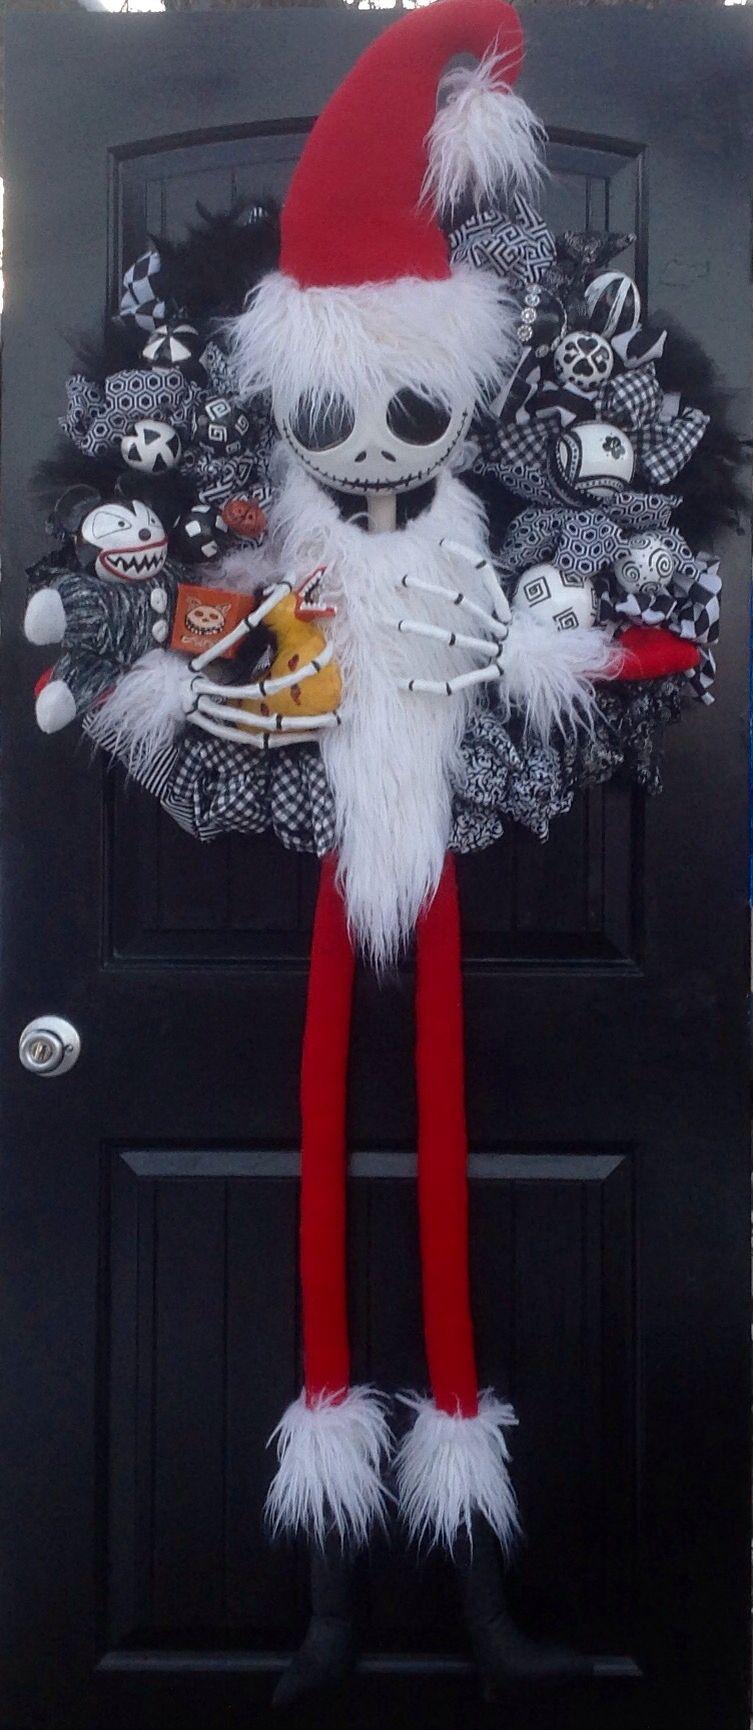 Nightmare Before Christmas Jack Skellington, Sandy Claws Wreath ...